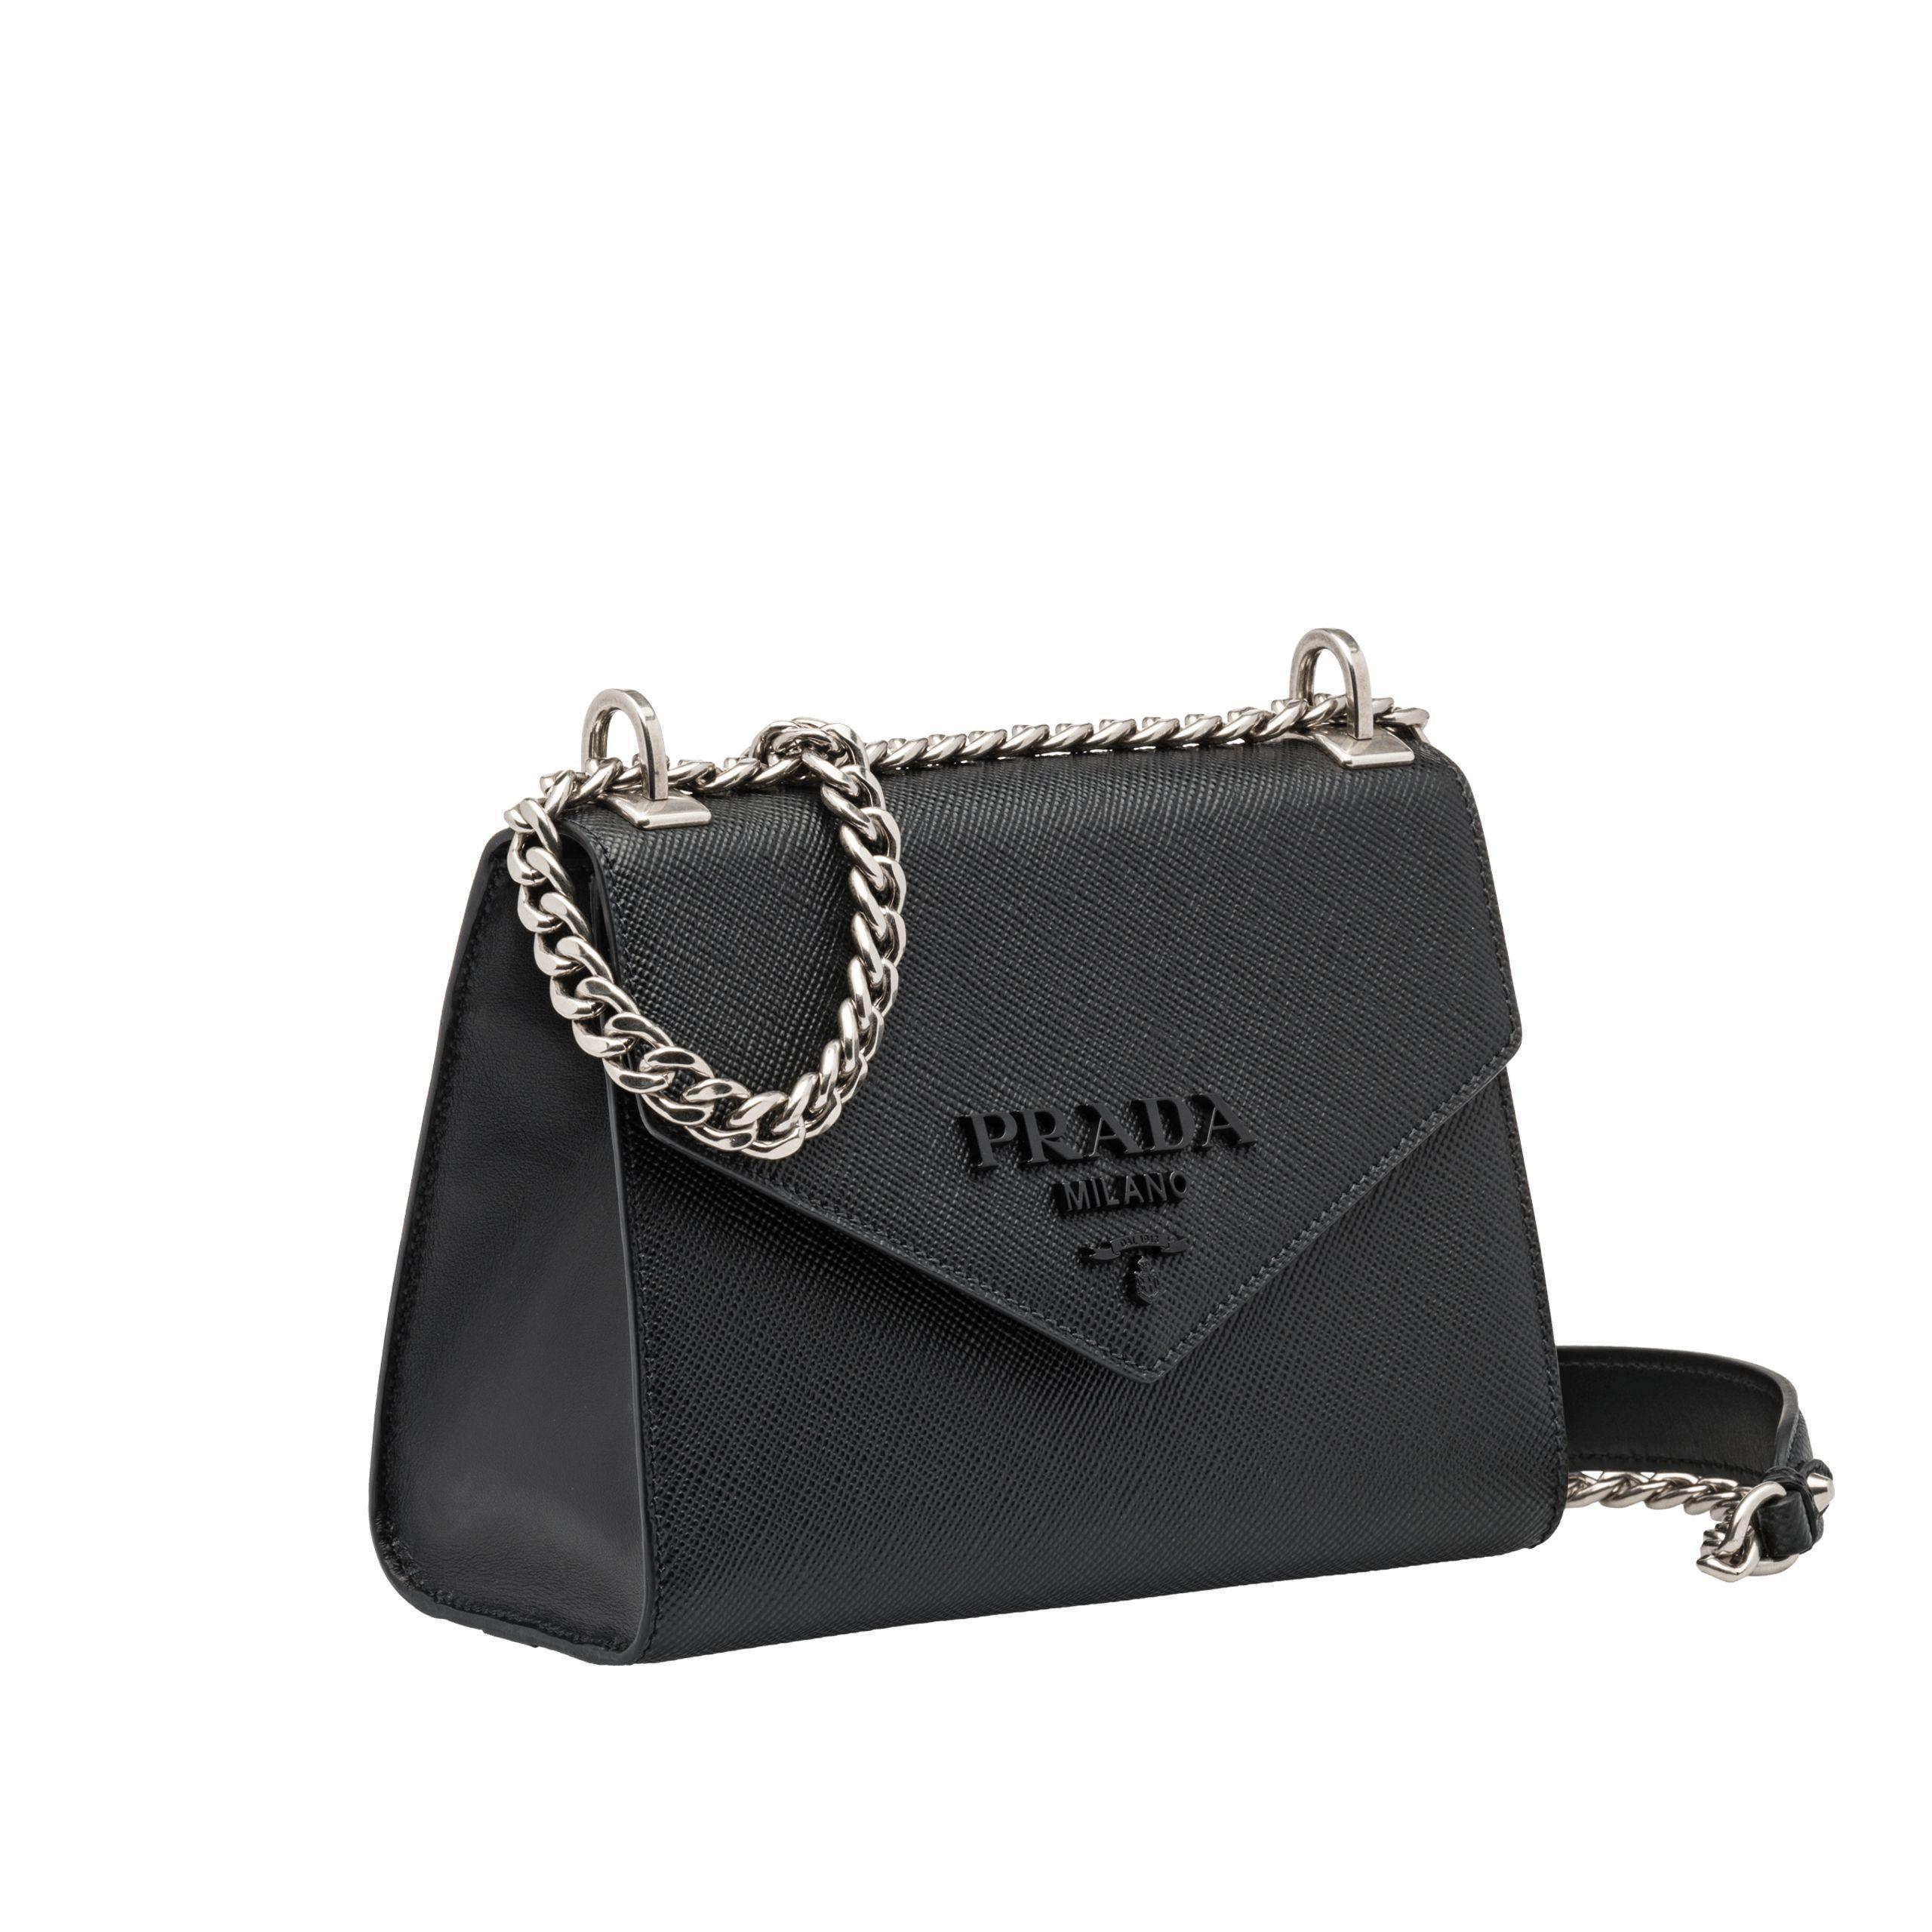 2d72acffc2e6 Lyst - Prada Monochrome Saffiano Leather Bag in Black